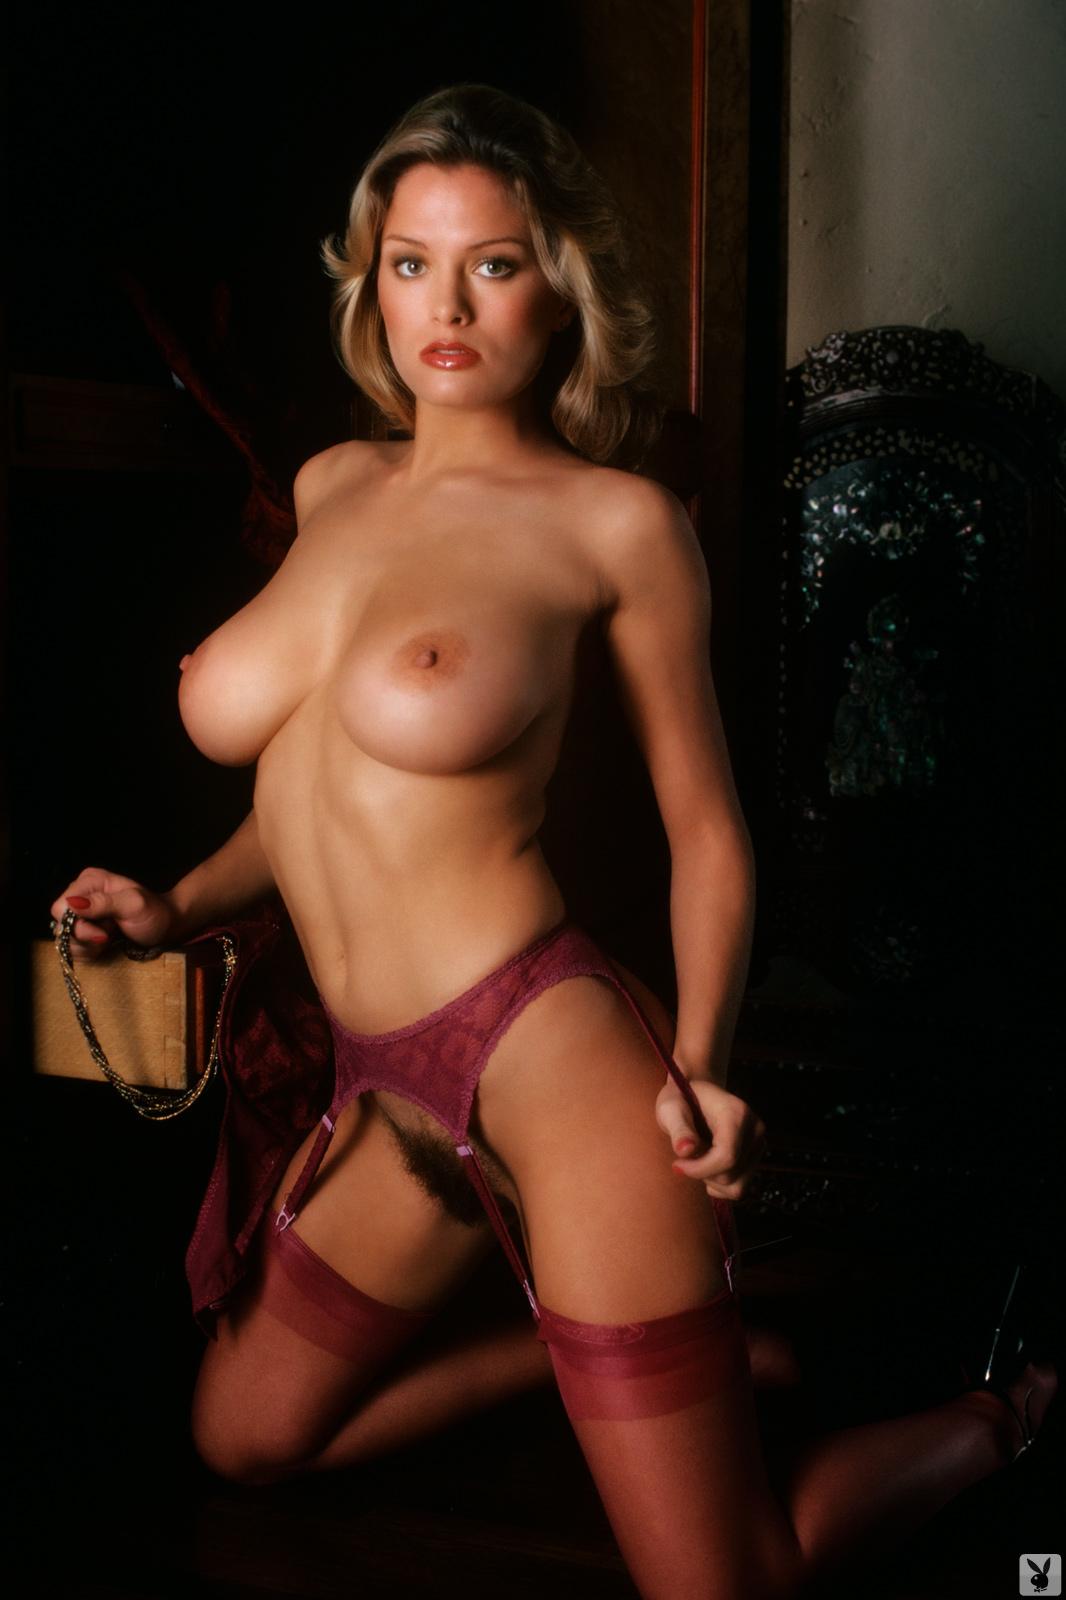 Gig gangel nude january 1980 vintage playboy 30 RedBust